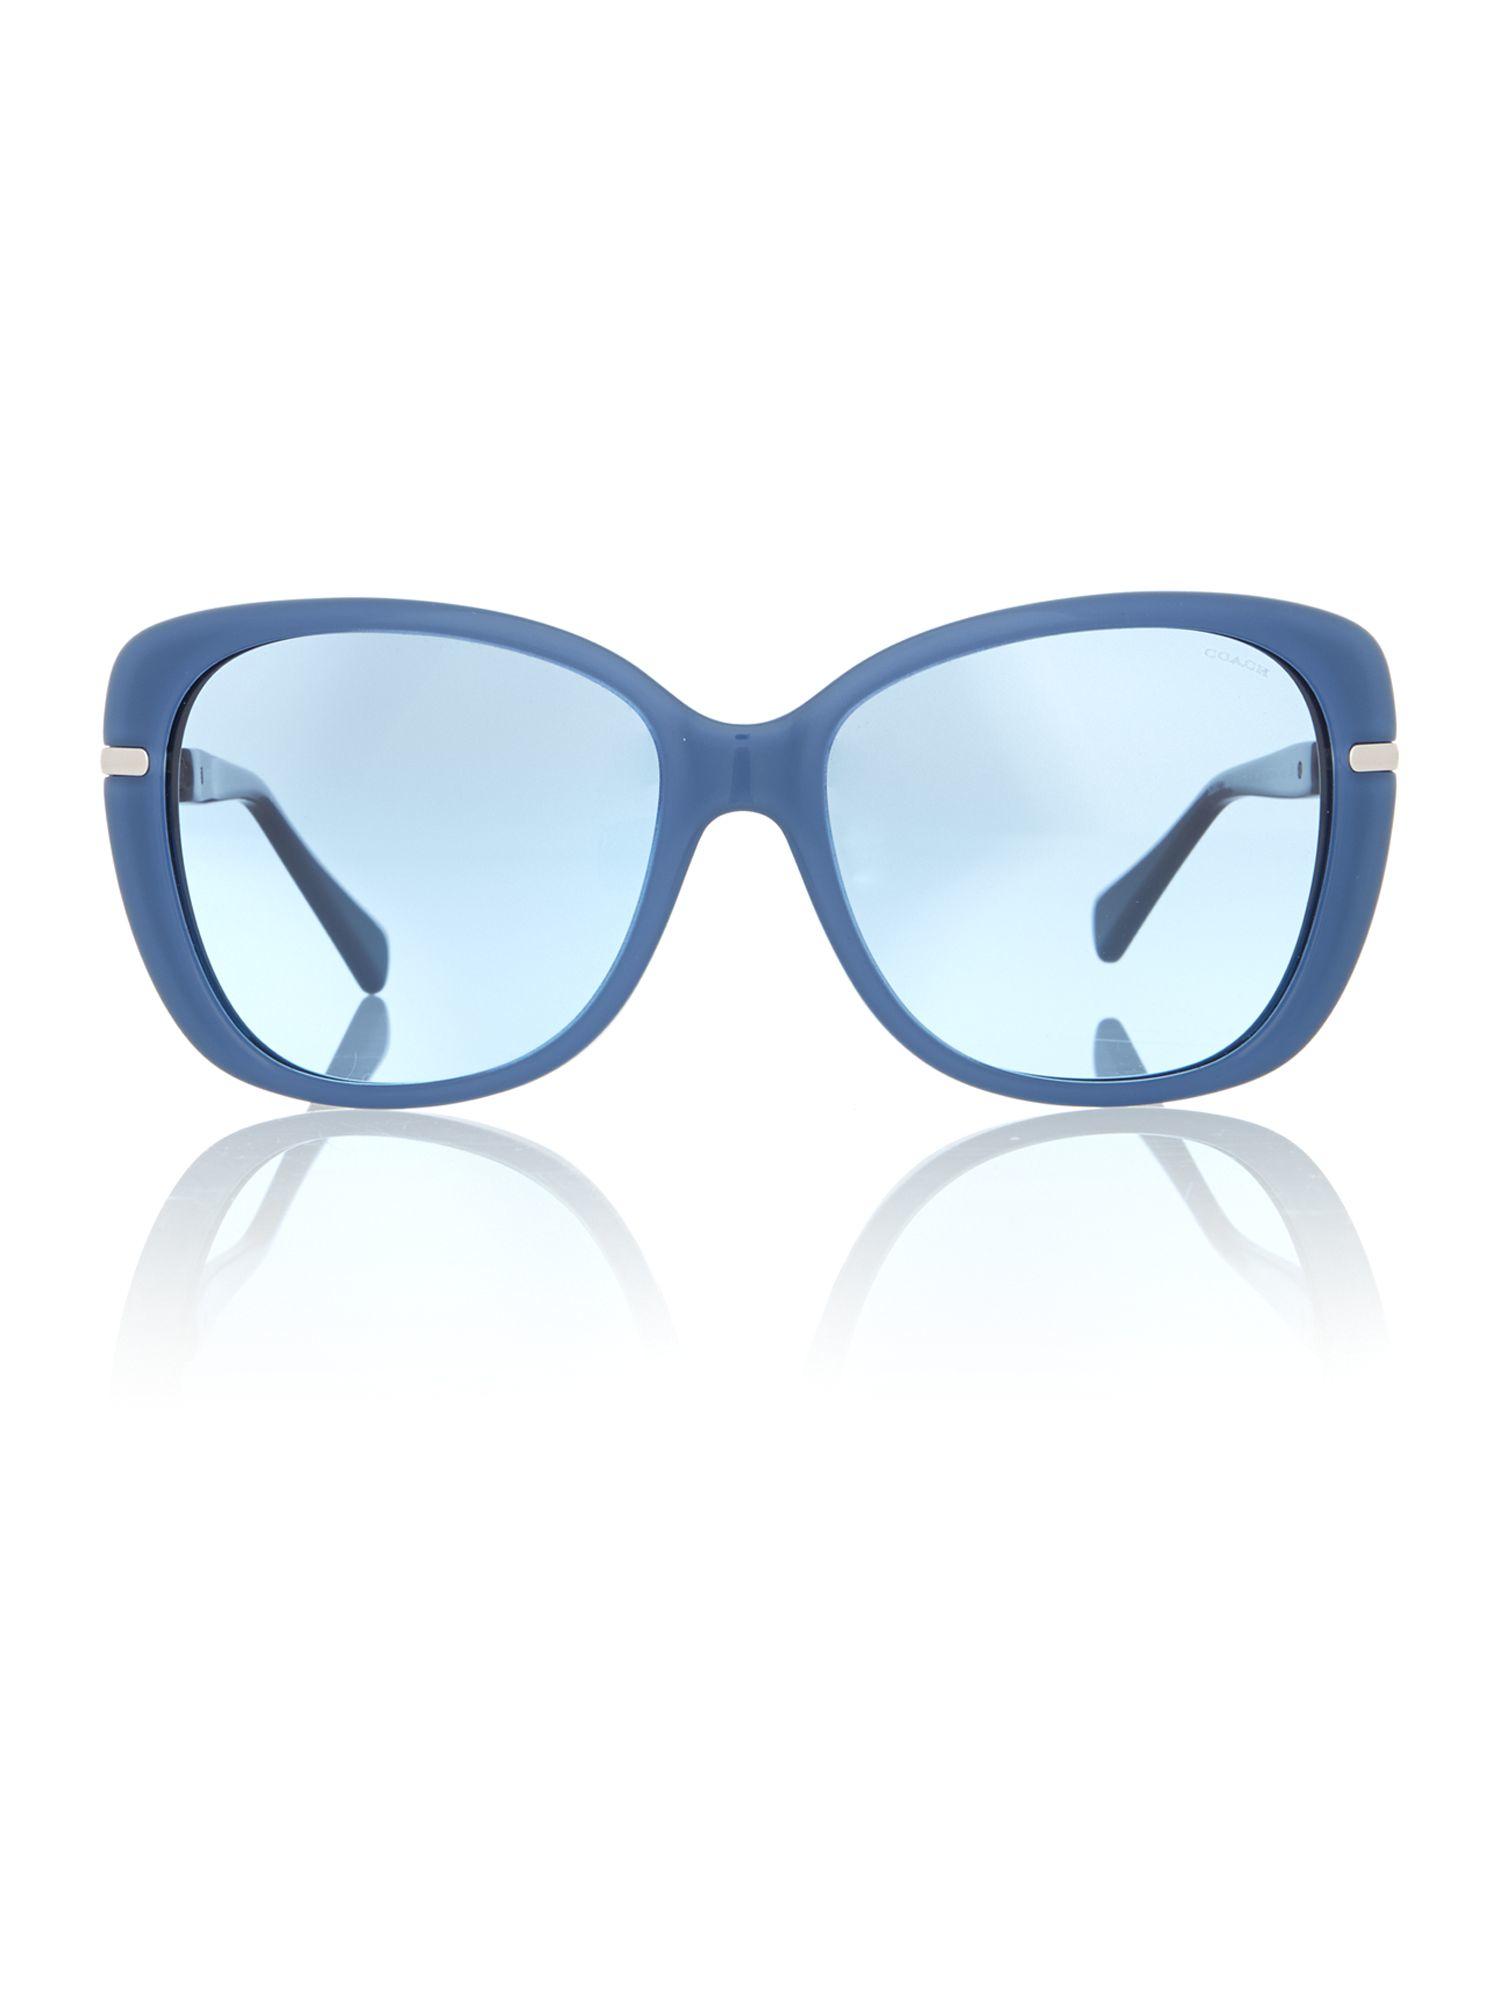 a6d247a492 ... cheap lyst coach hc8131 cat eye sunglasses in blue 6426d 9b581